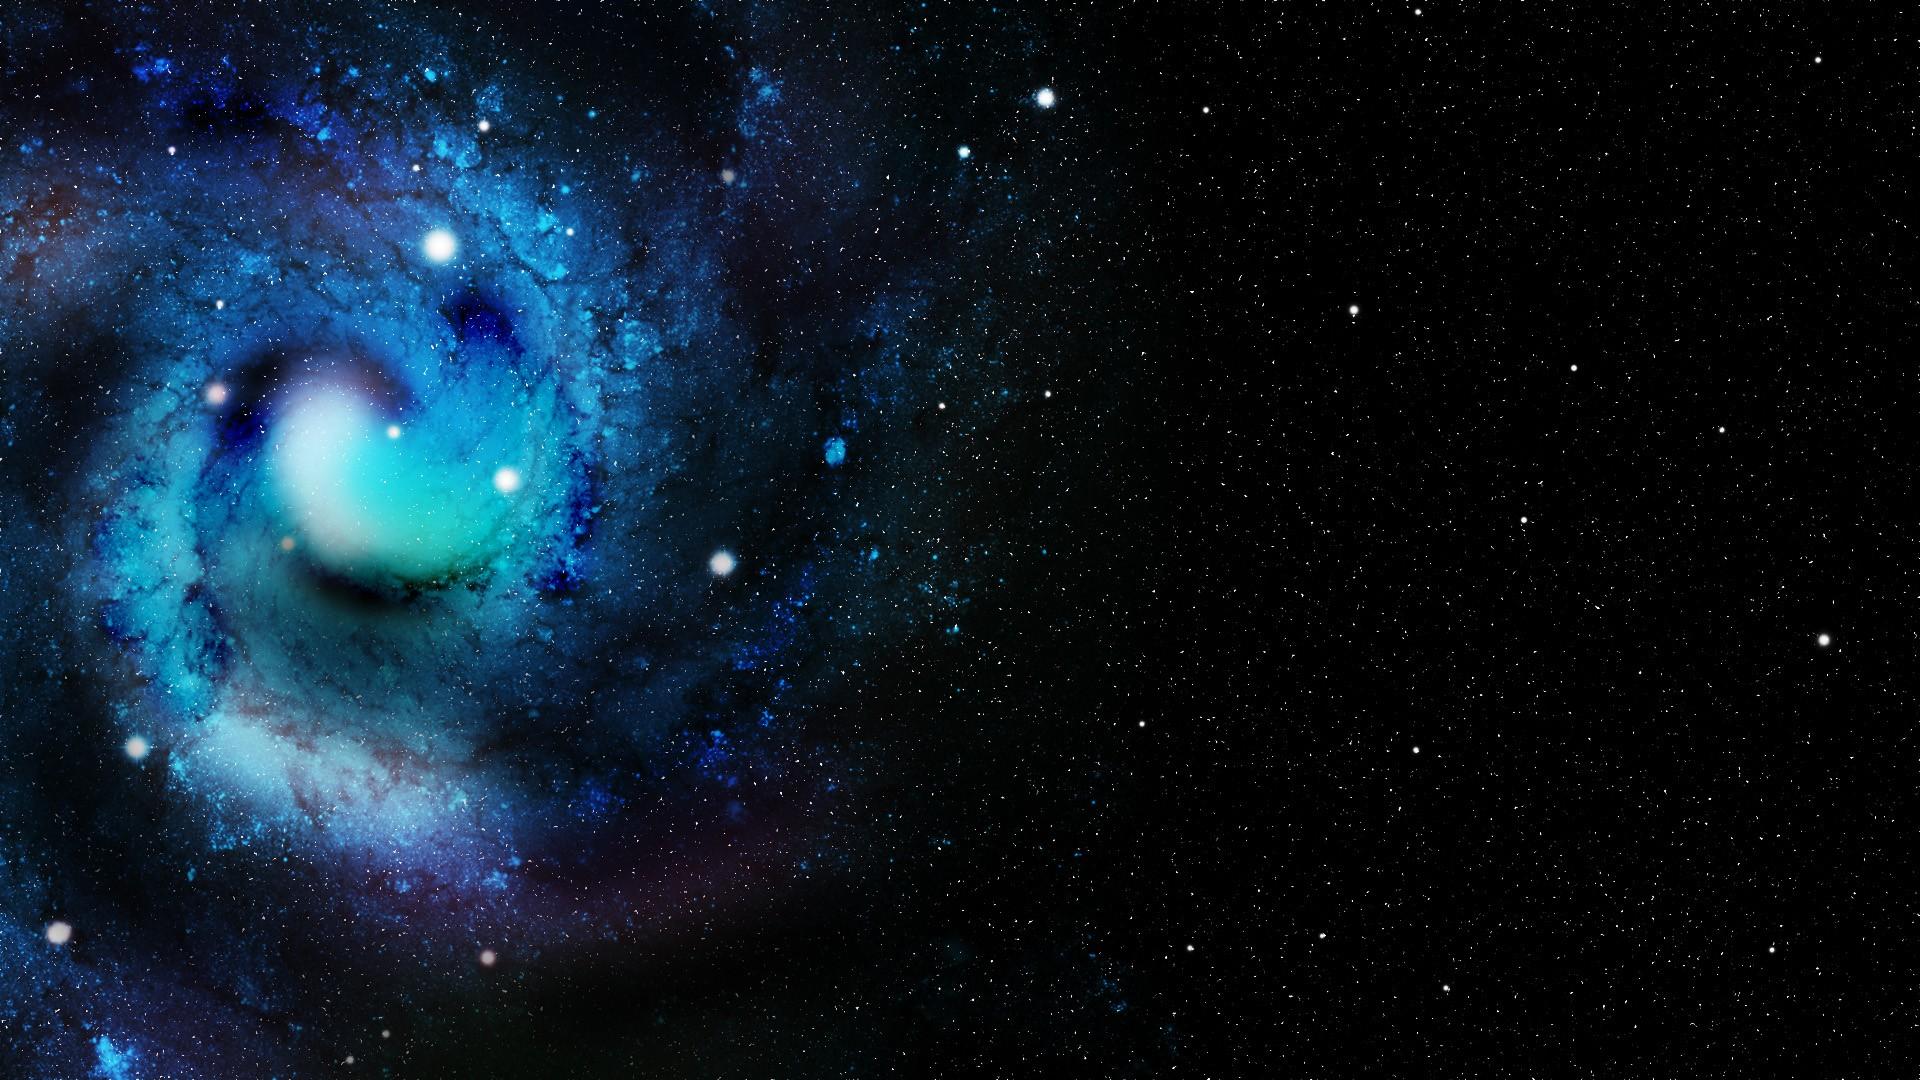 wallpaper : colorful, digital art, stars, space art, nebula